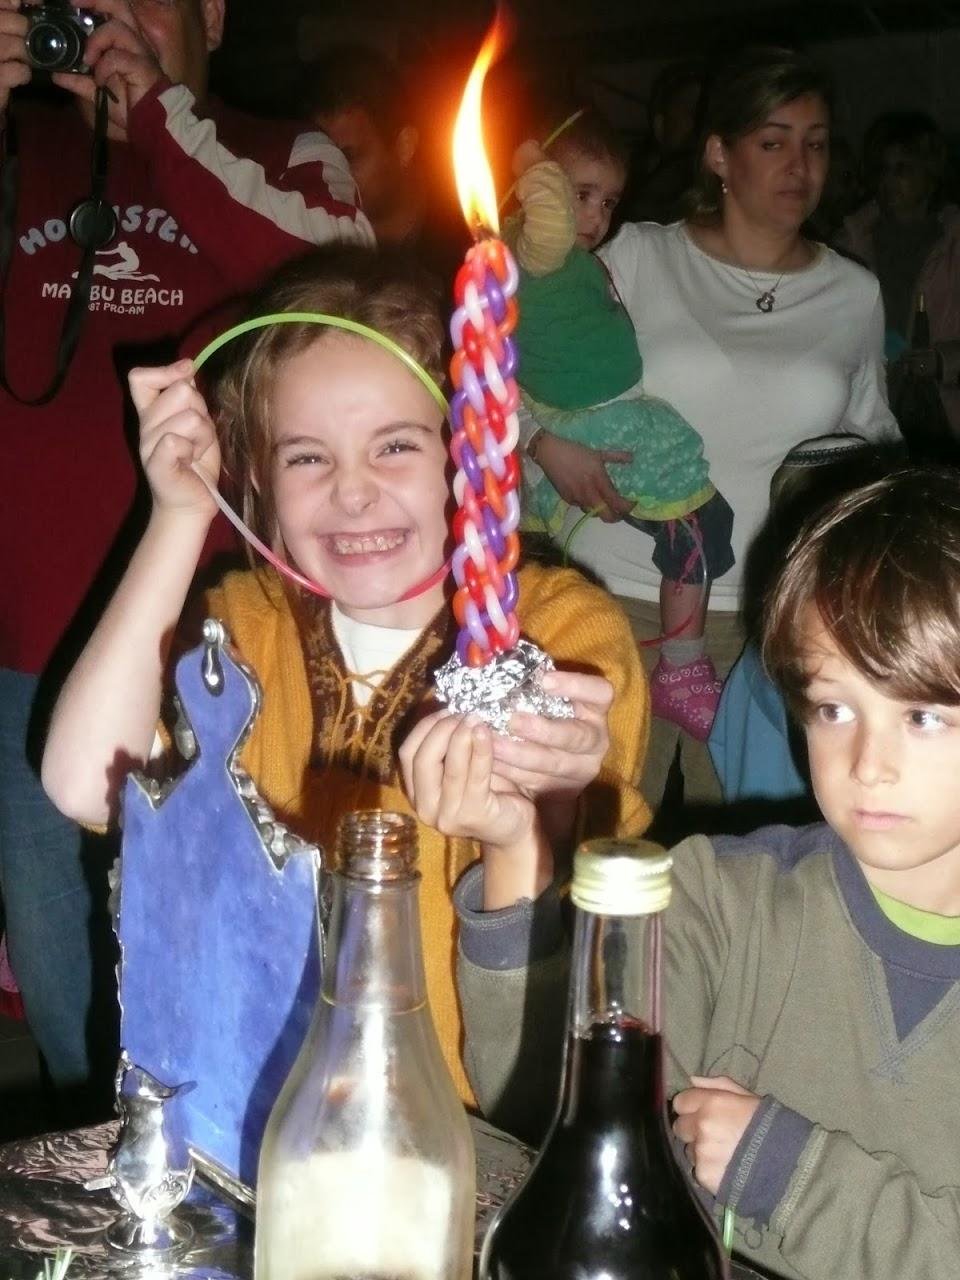 Hanukkah 2009  - 2009-12-12 17.34.55 %28deleted 3f84a0c757c9d1377c627acb3e6ac6b0%29.jpg